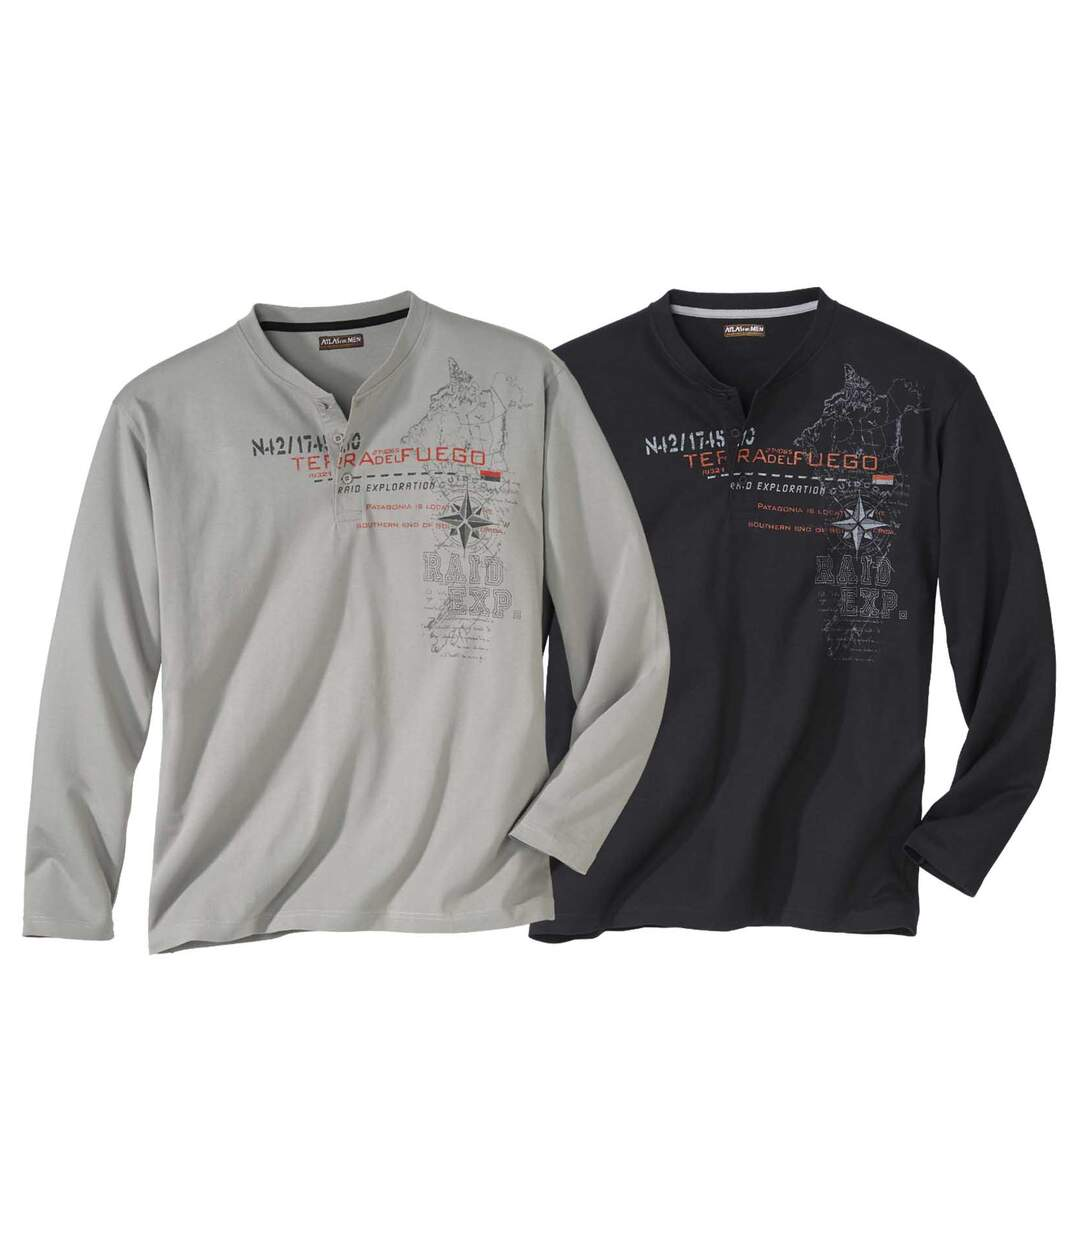 Sada 2 triček Kordillery